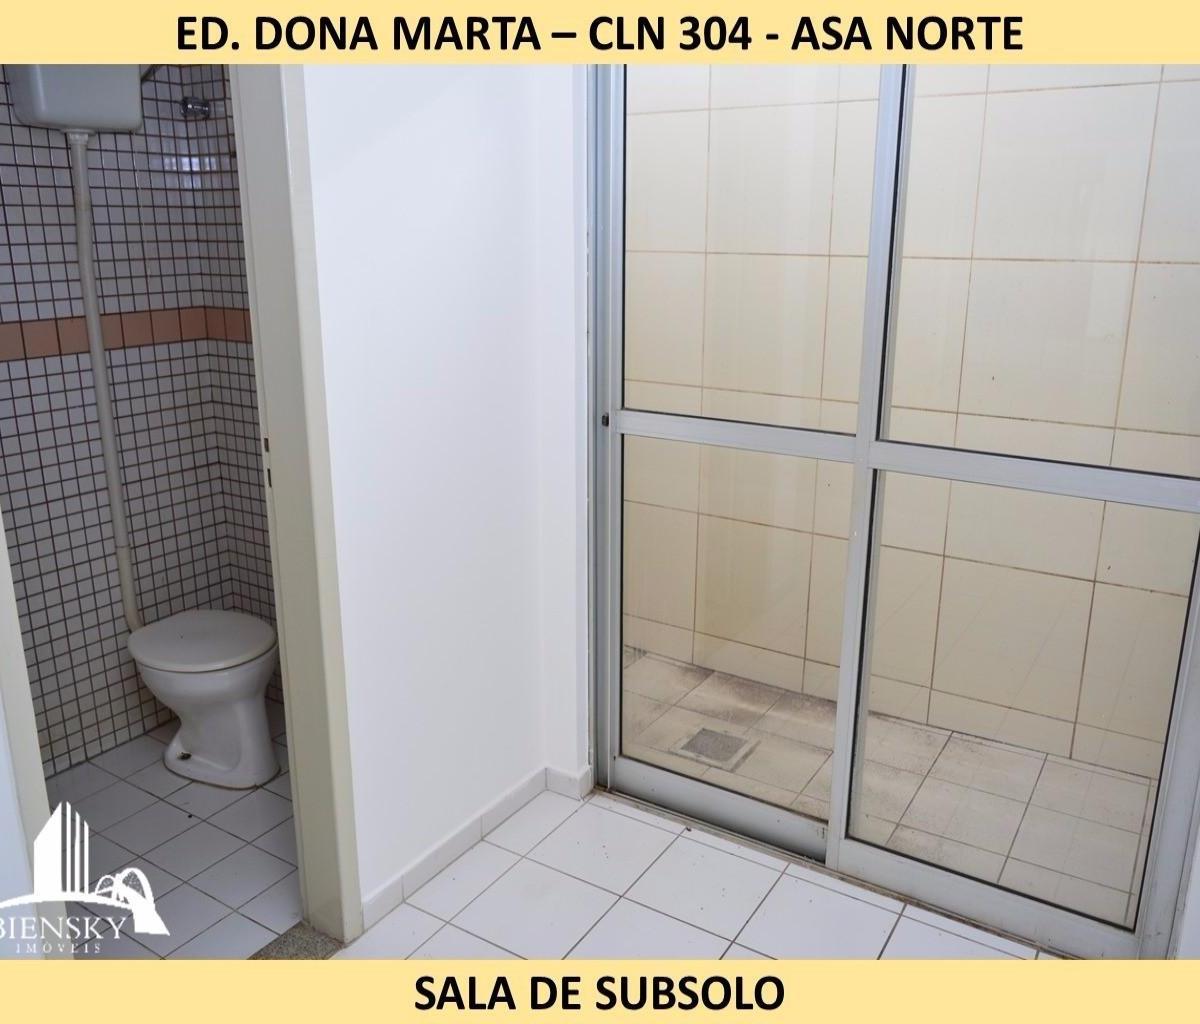 Imagens de #A48627 cln 304 bloco d loja de subsolo cln 304 bloco d asa norte brasília 1200x1024 px 3346 Bloco De Cad Banheiro Publico